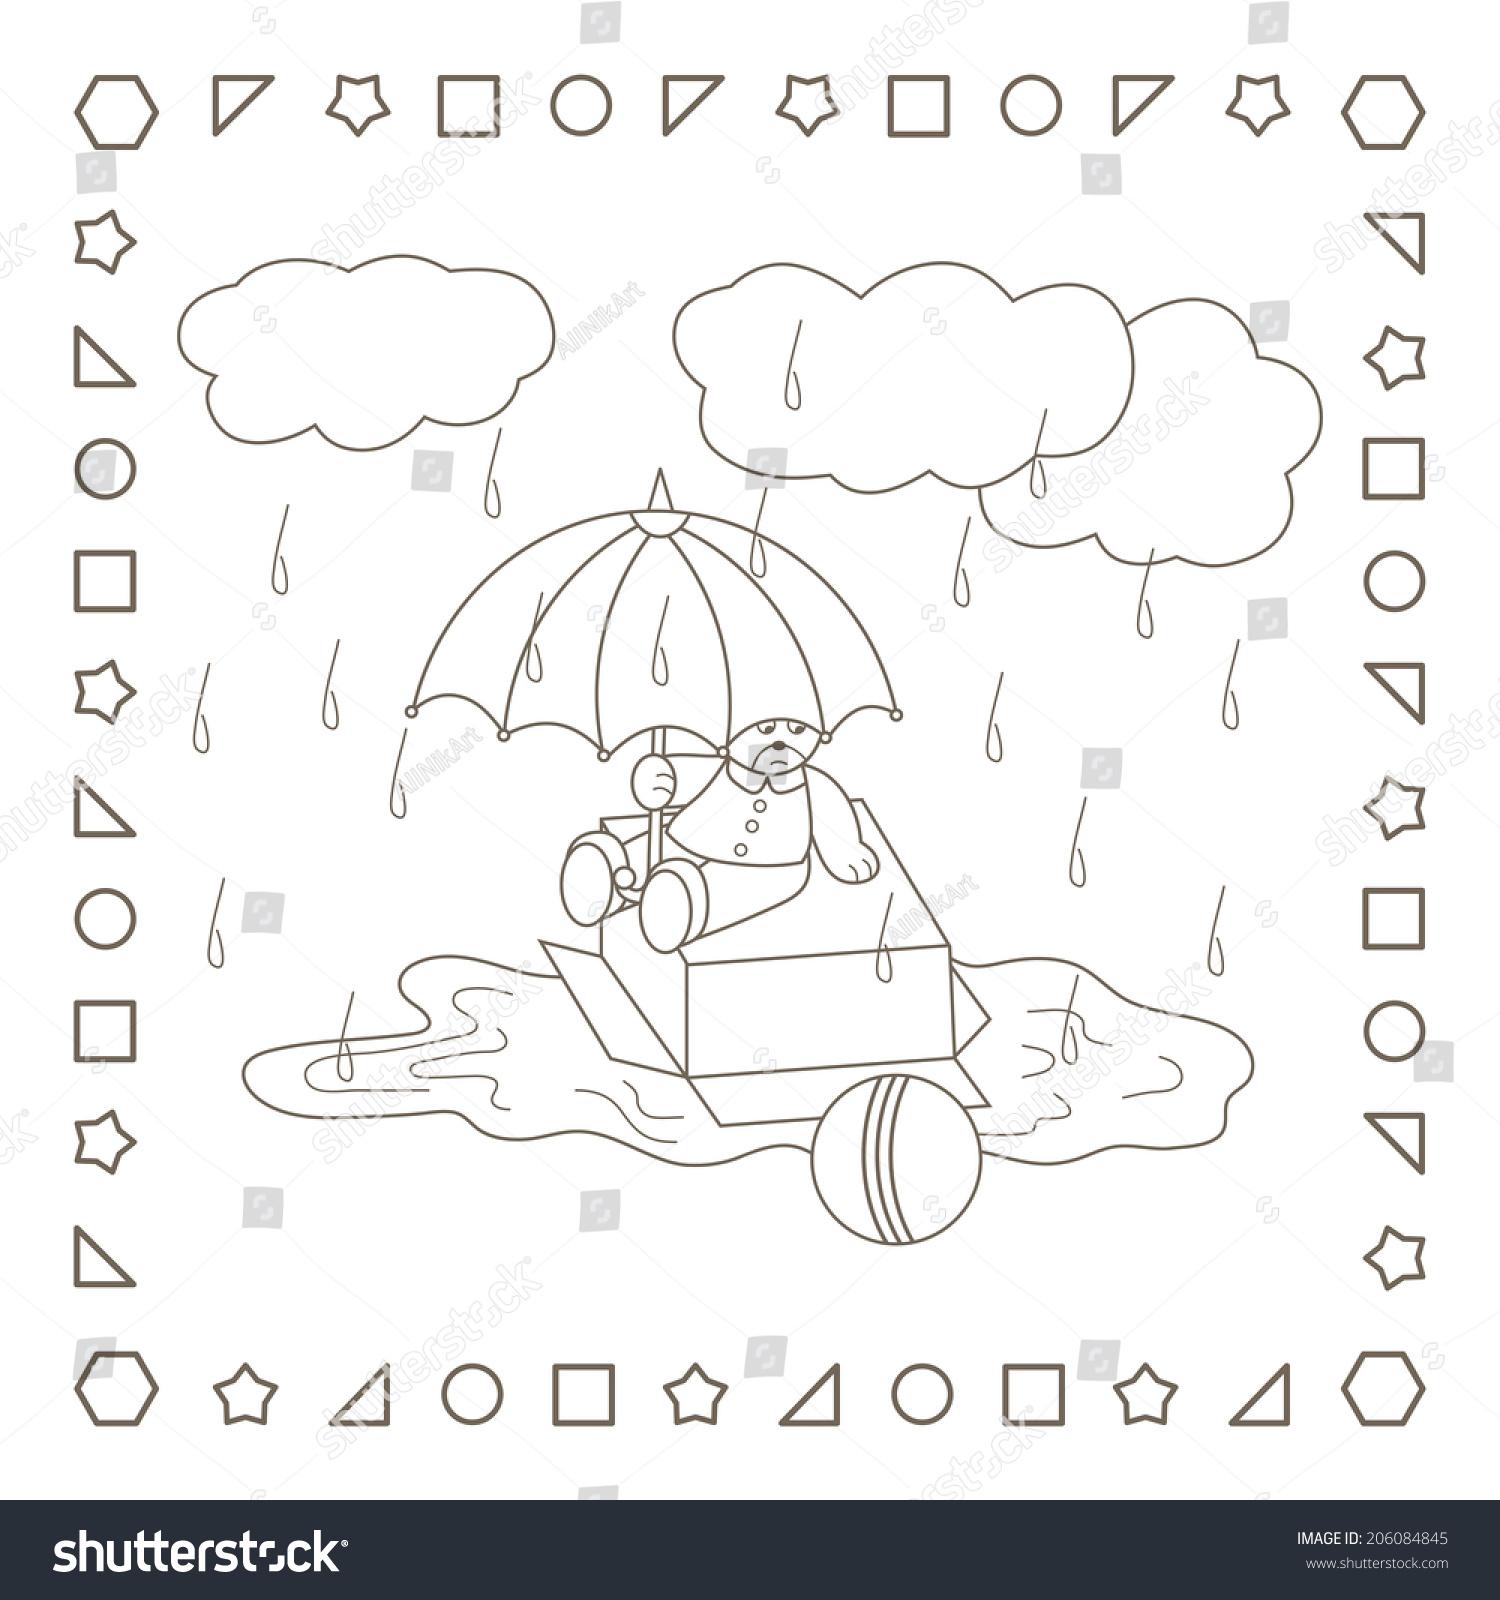 Rainy Weather Teddy Bear Umbrella Coloring Stock Illustration